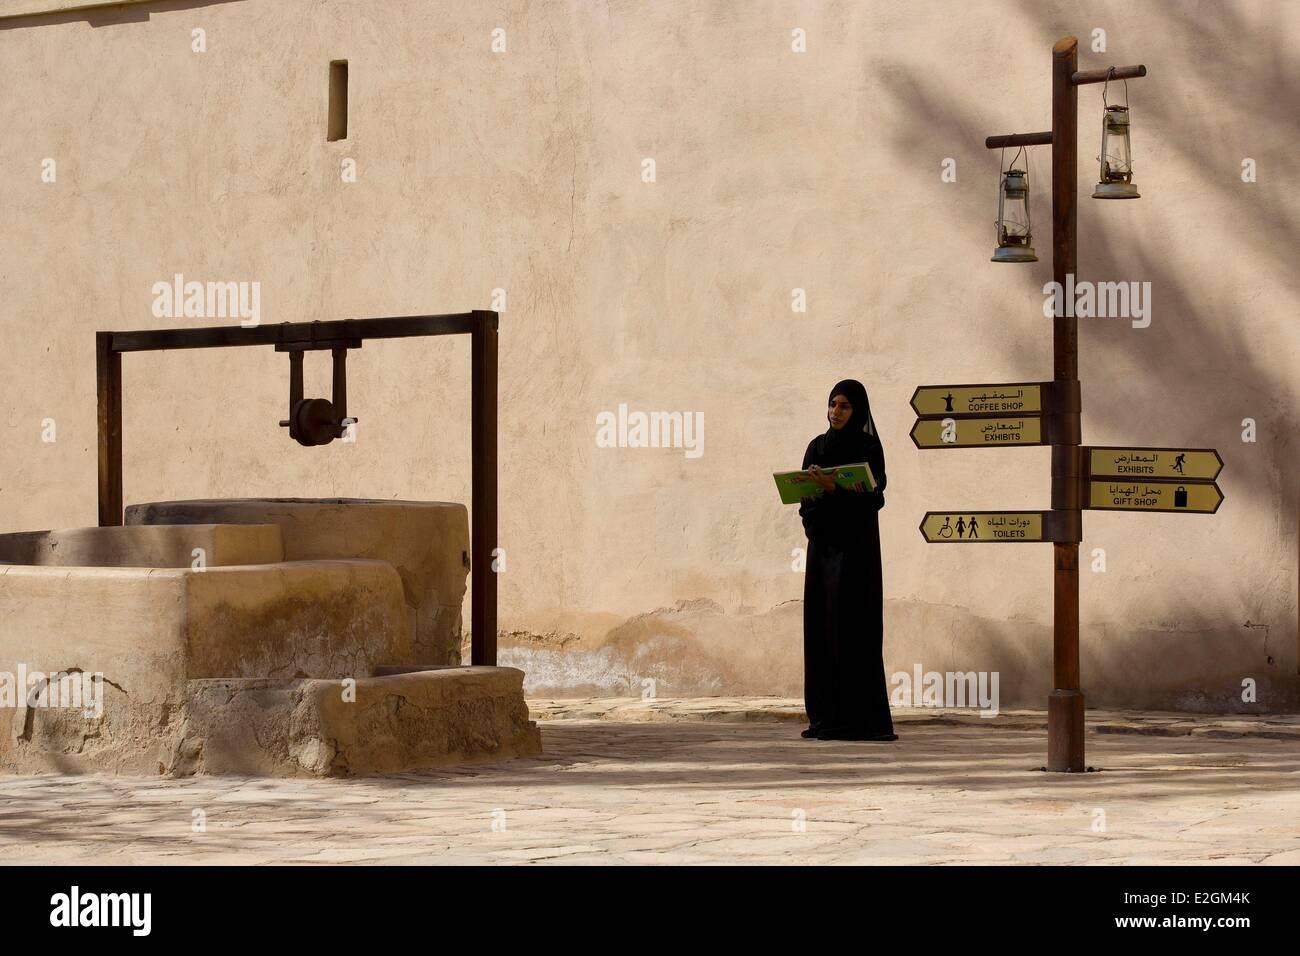 Sultanat d Oman annonce Dakhiliyah Nizwa montagnes Hajar occidental région fort Photo Stock